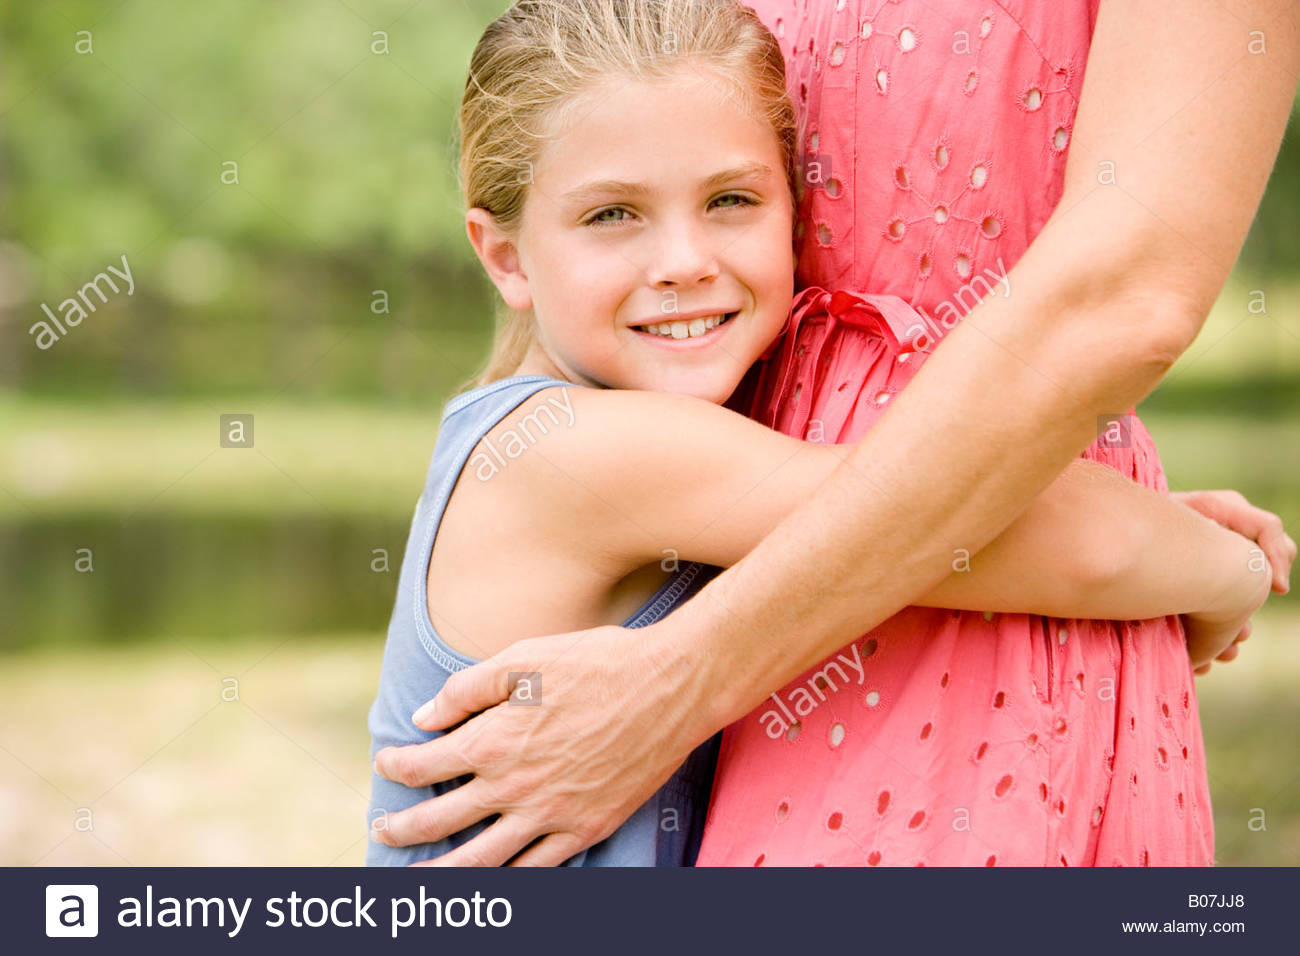 girl hugging woman around the waist - Stock Image